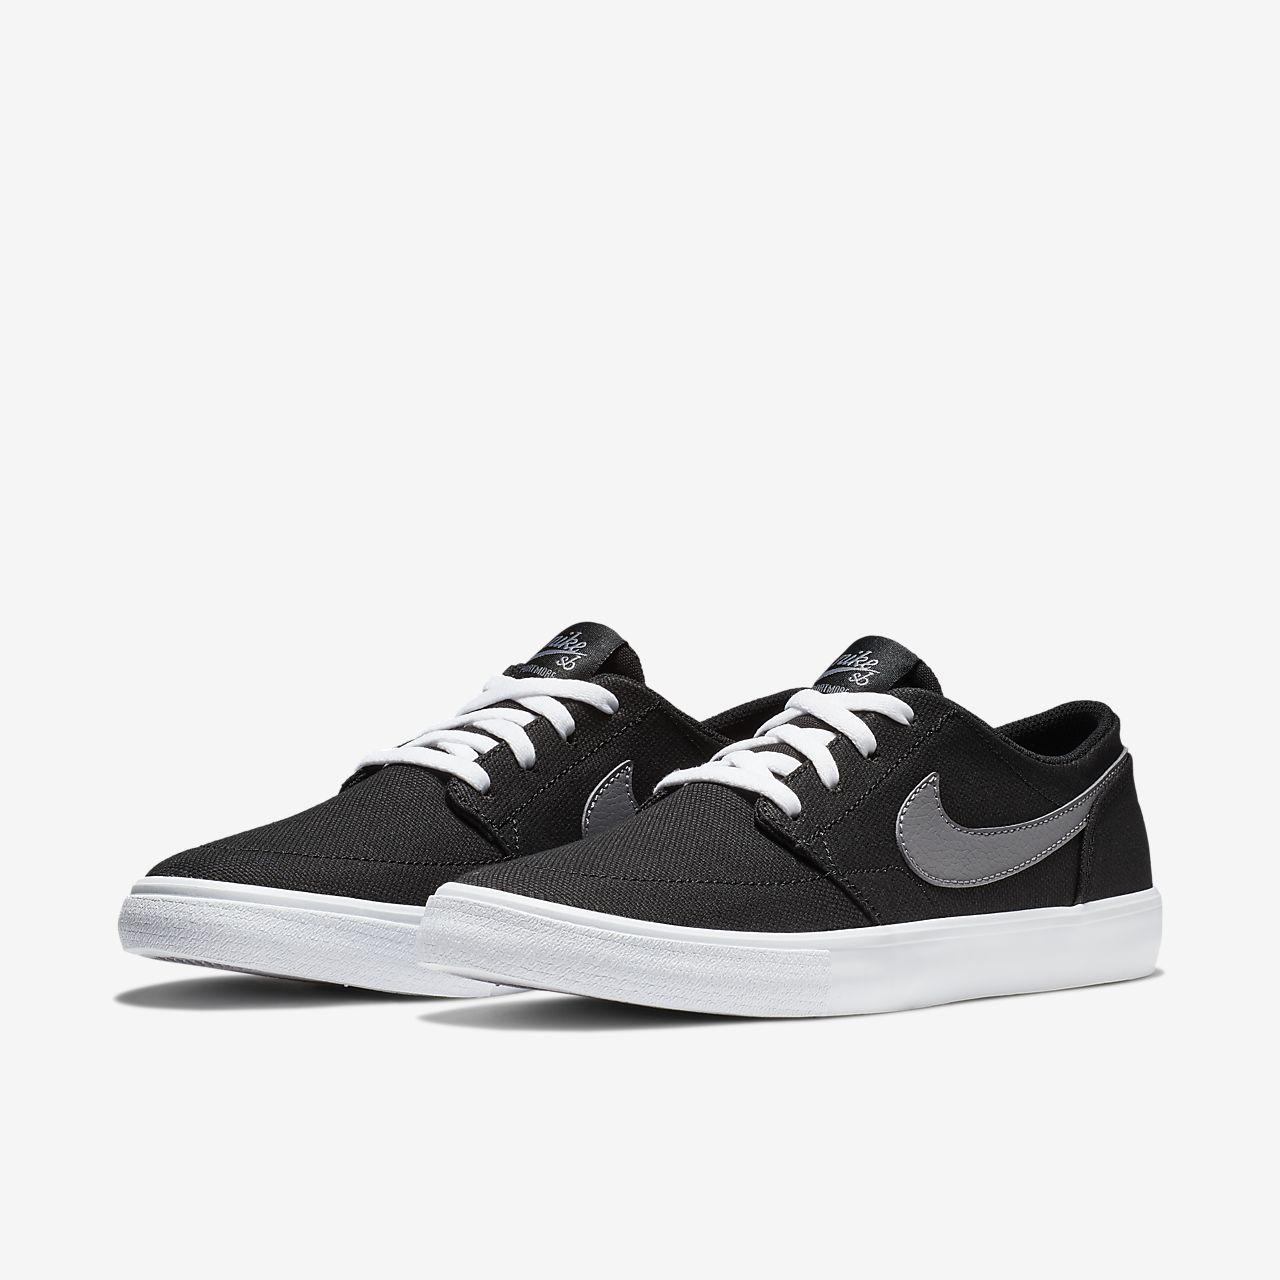 buy online 4b299 d2984 Nike SB Solarsoft Portmore II Women's Skateboarding Shoe. Nike.com